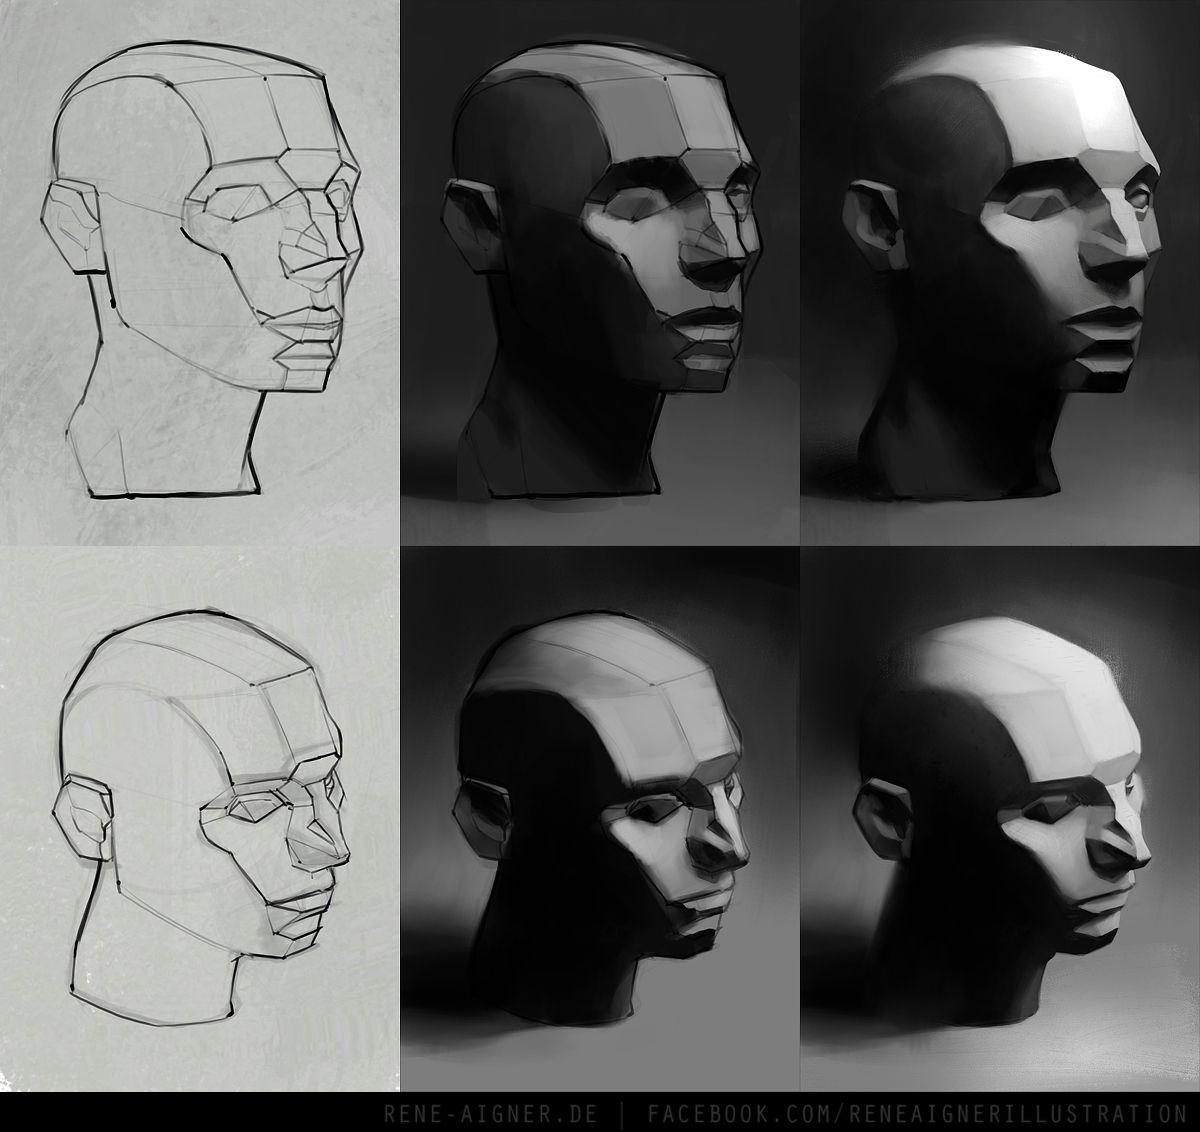 René Aigner's Sketchbook via PinCG.com head - faceted - constructive drawing - volumes